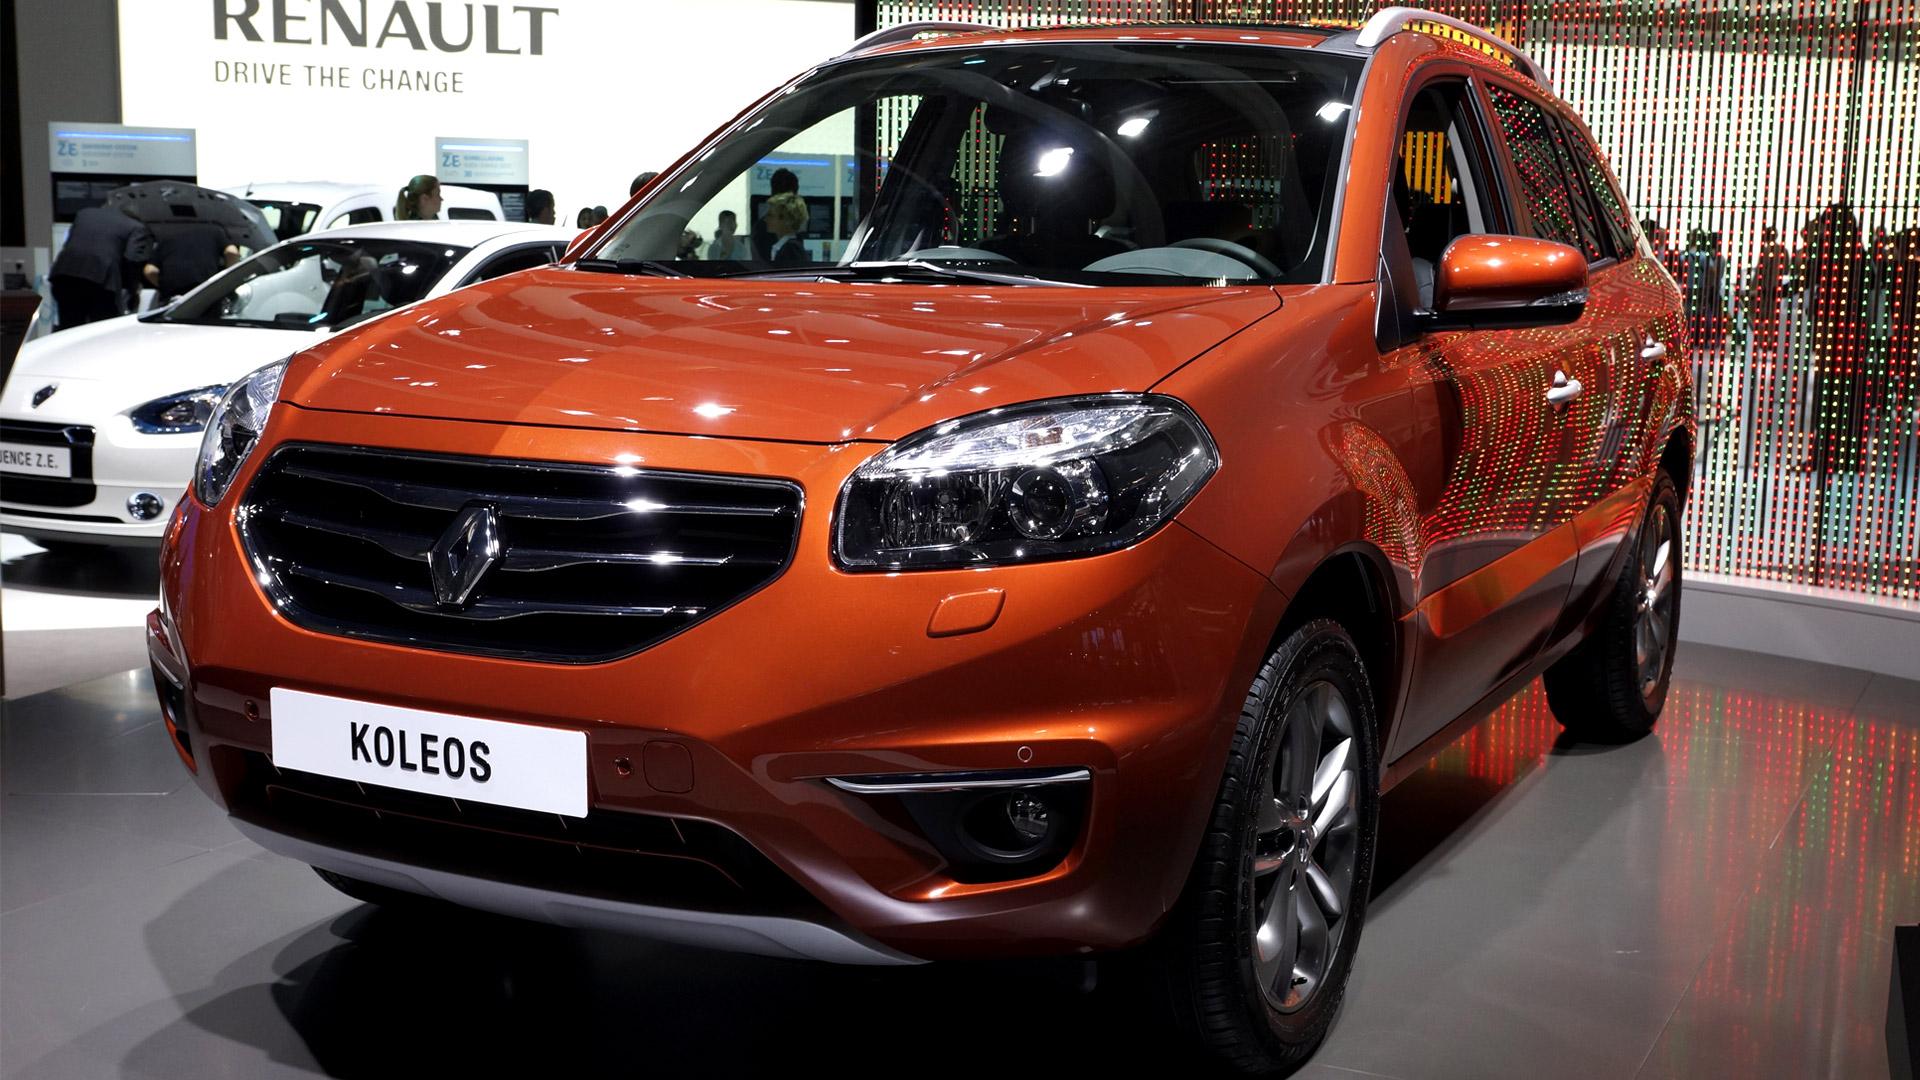 2014 Renault Koleos Facelift Review